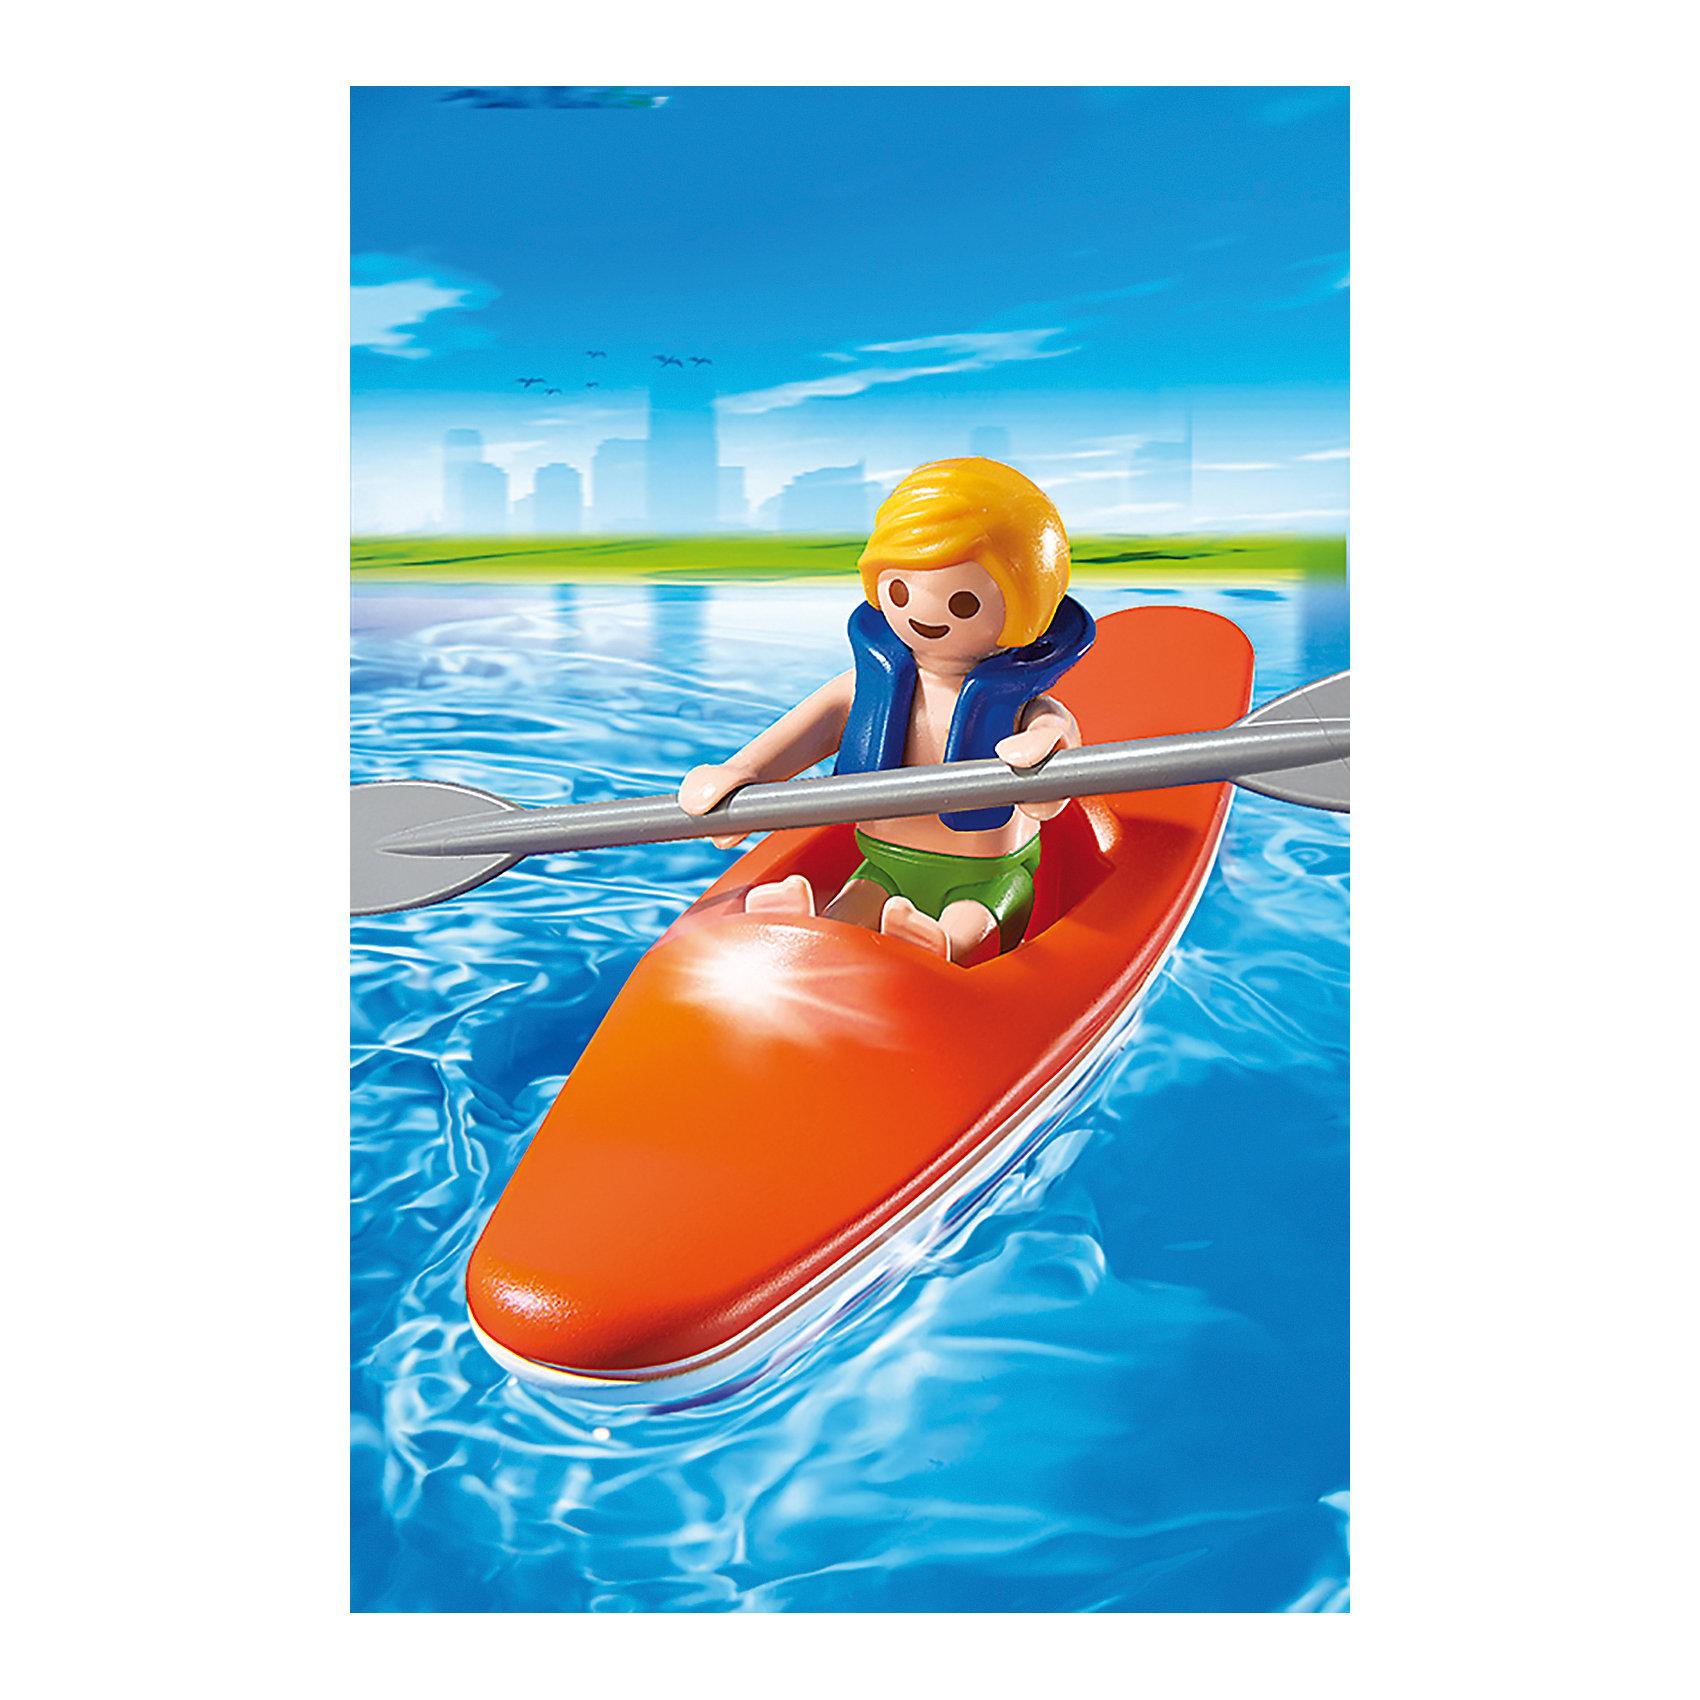 PLAYMOBIL® Аквапарк: Ребенок в каяке, PLAYMOBIL ram 390 rbu крепление спиннинга на лодке каяке